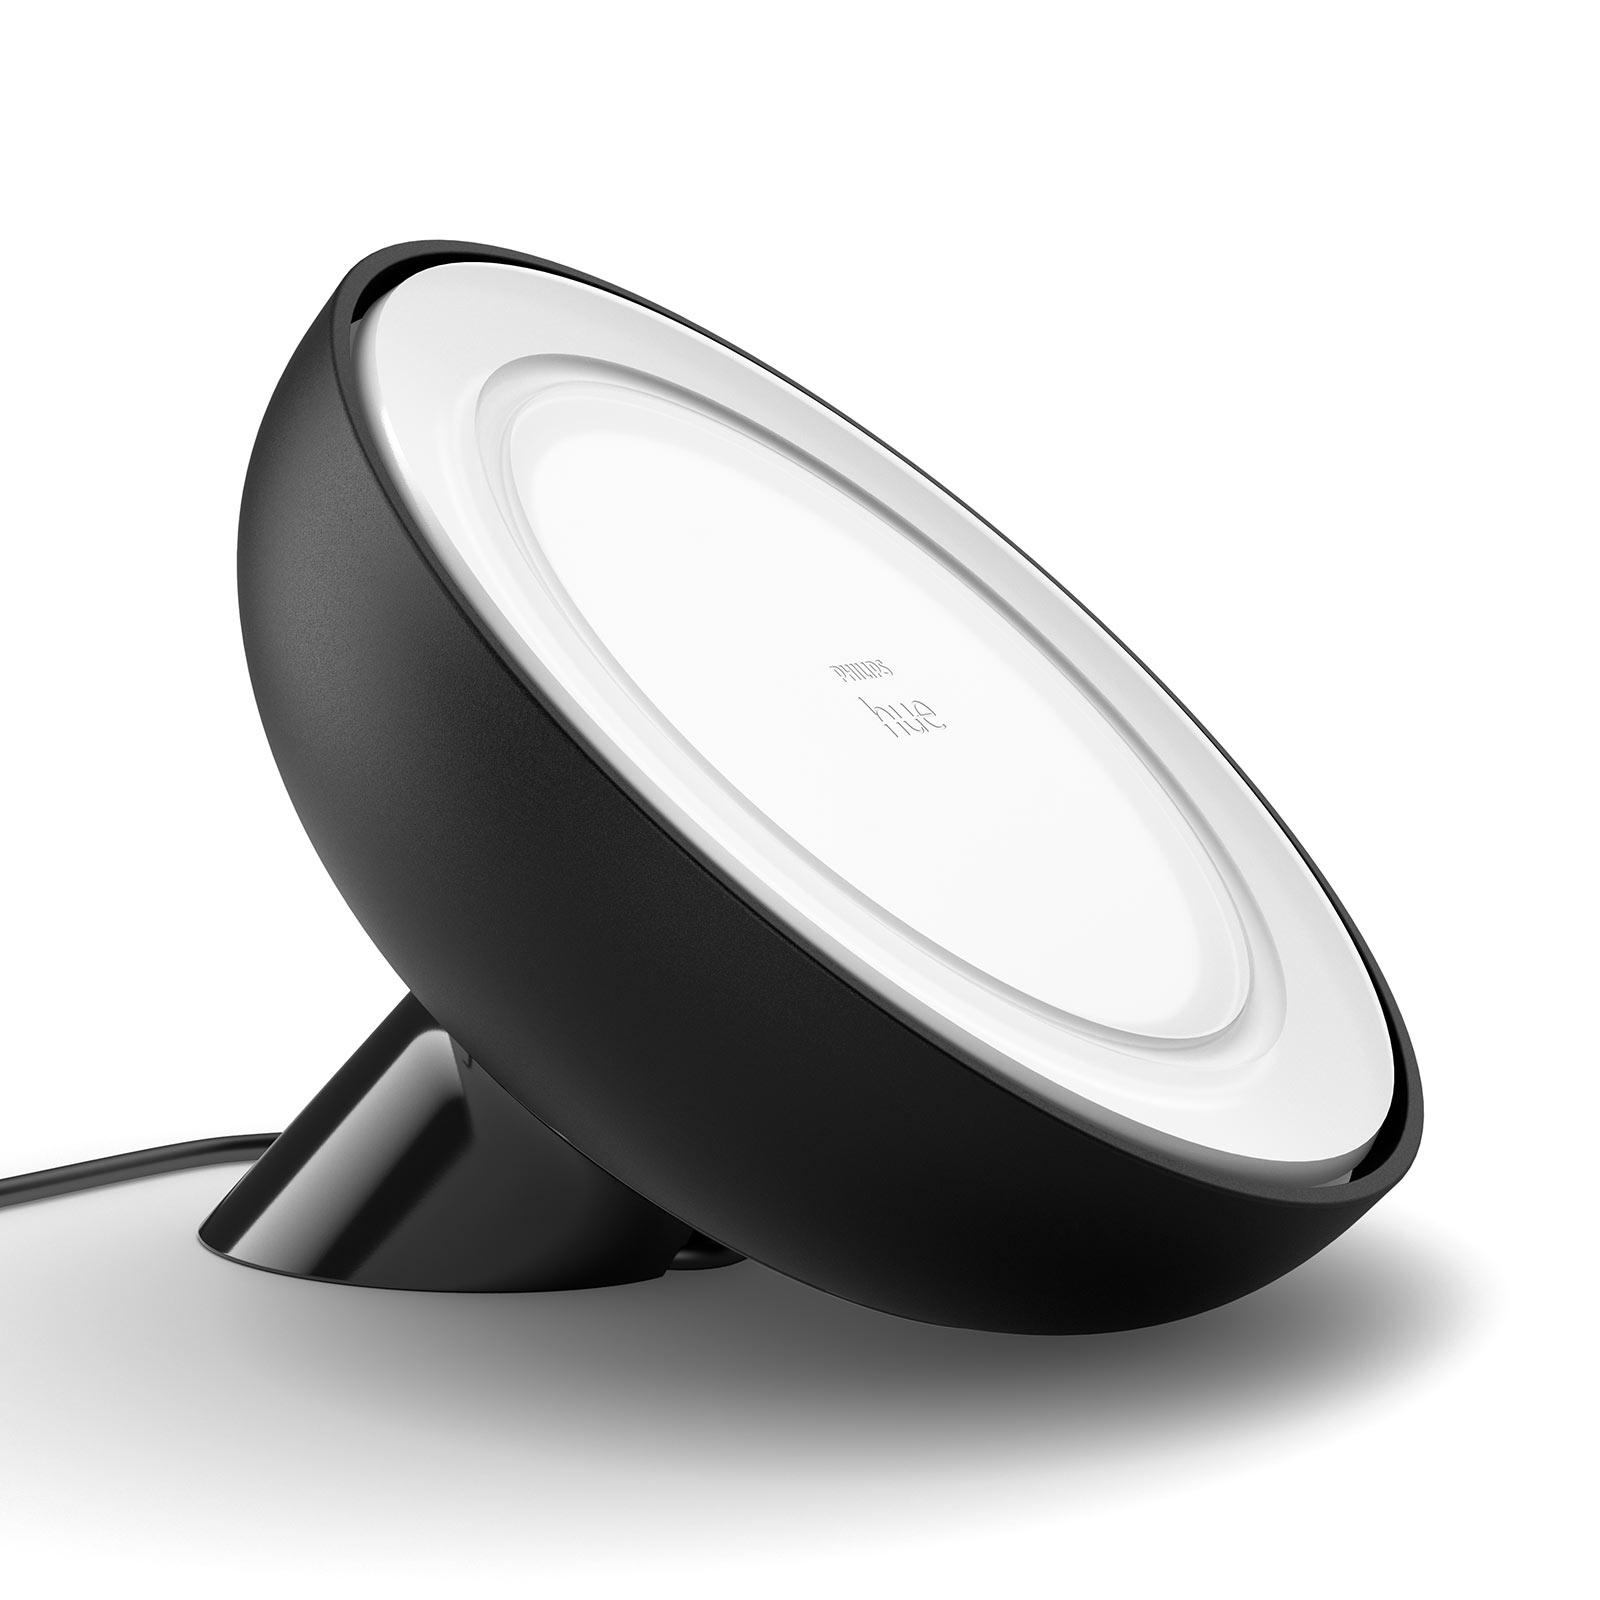 Philips Hue Bloom bordlampe svart, white & color